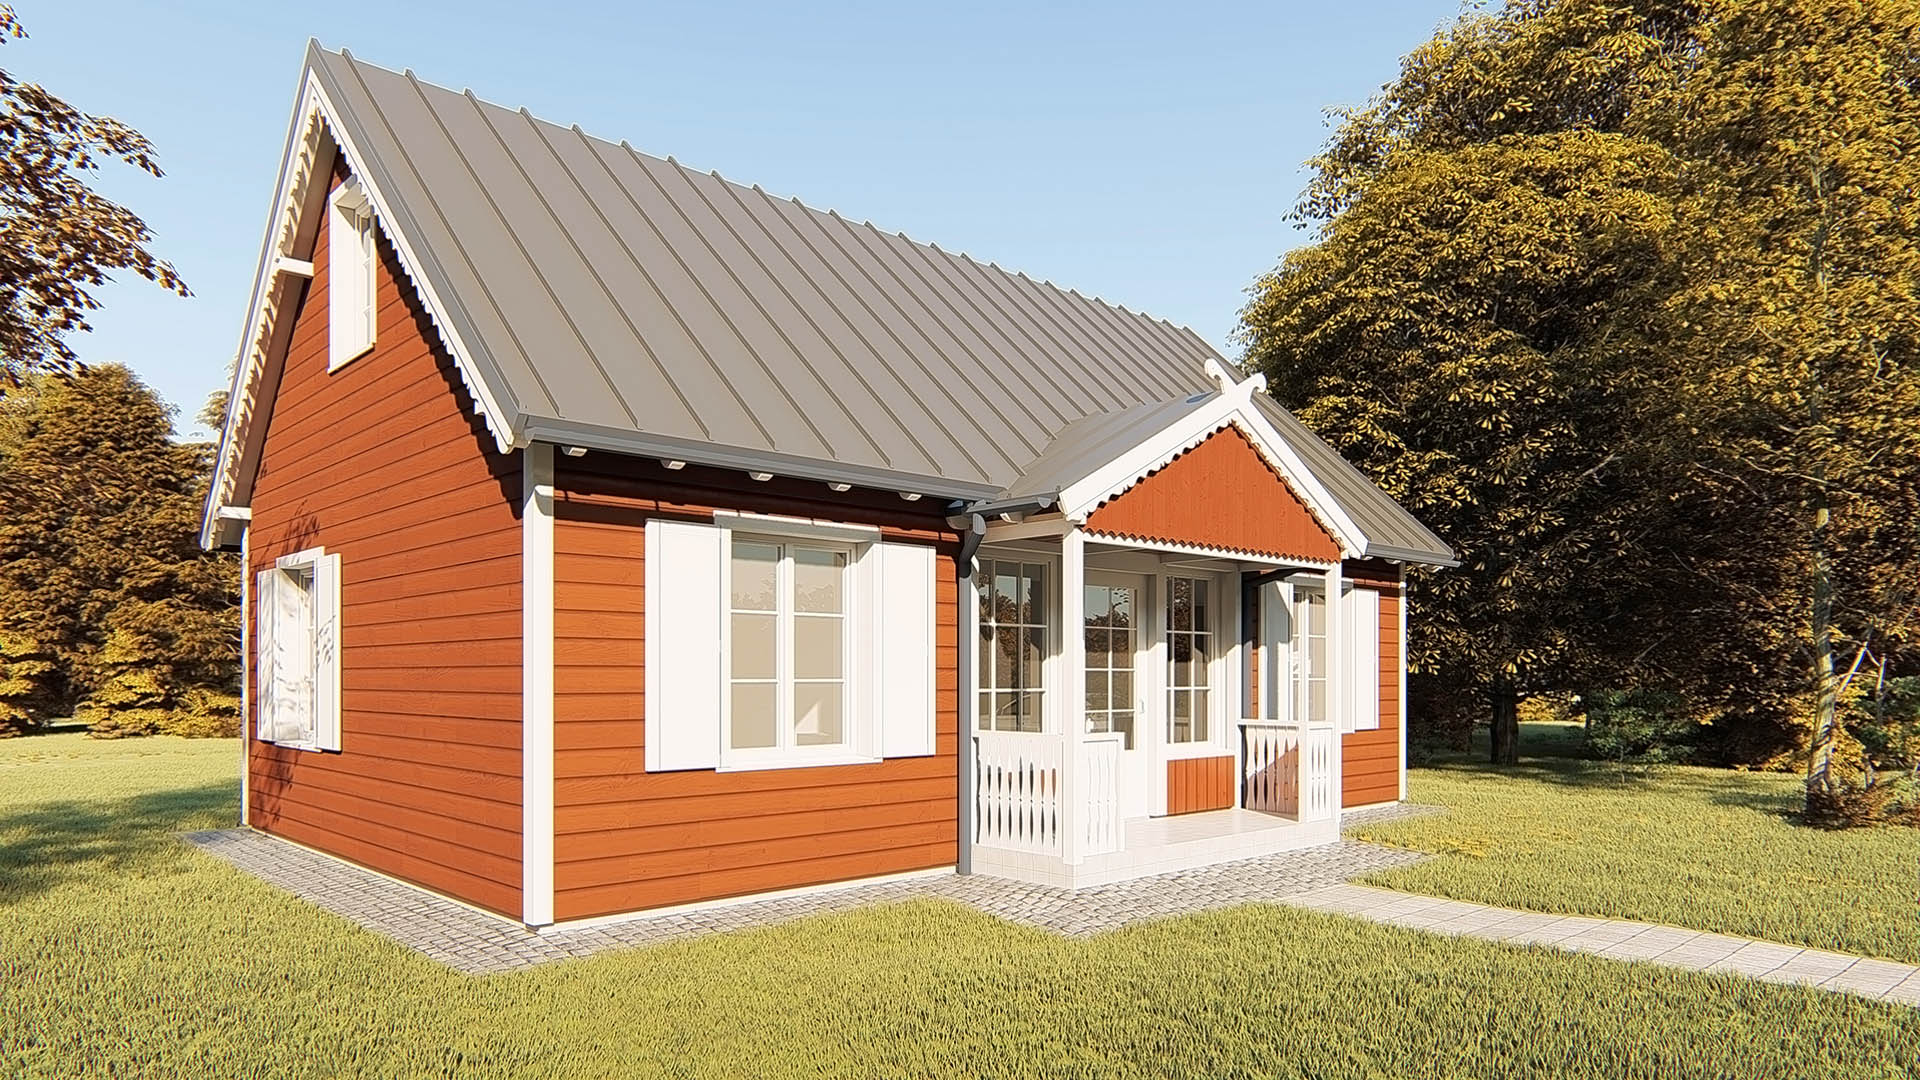 tradicinio kaimo stiliaus poilsio namelio iki 80 m2 bendrojo ploto projektas